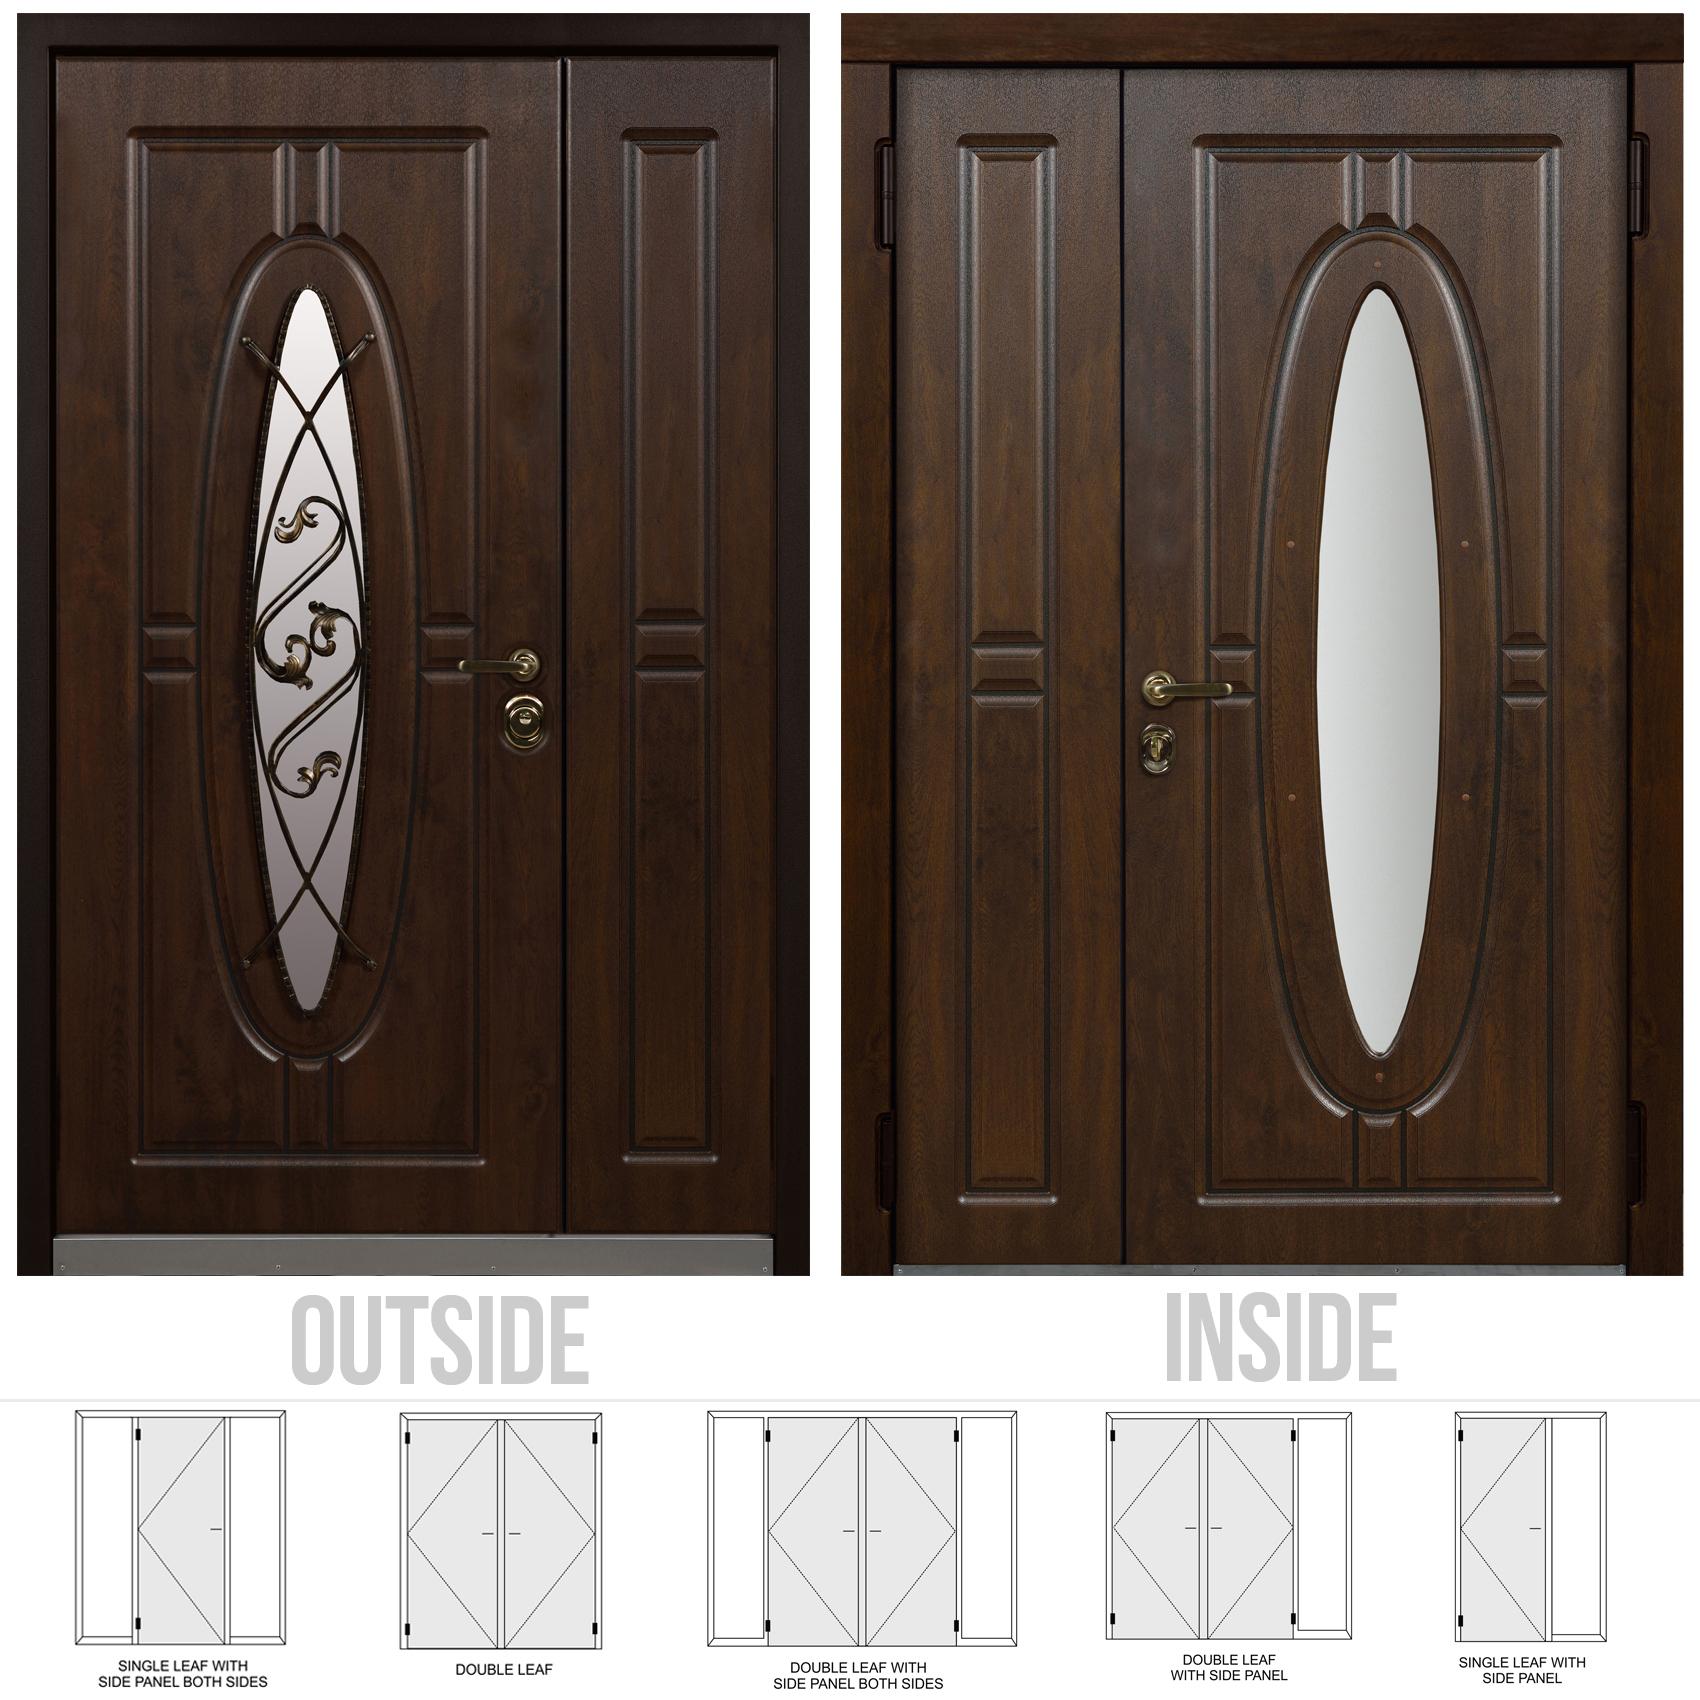 ... Monarch Double Front Door ... & Buy Monarch Double front door at a bargain price from Novo Porte at ...